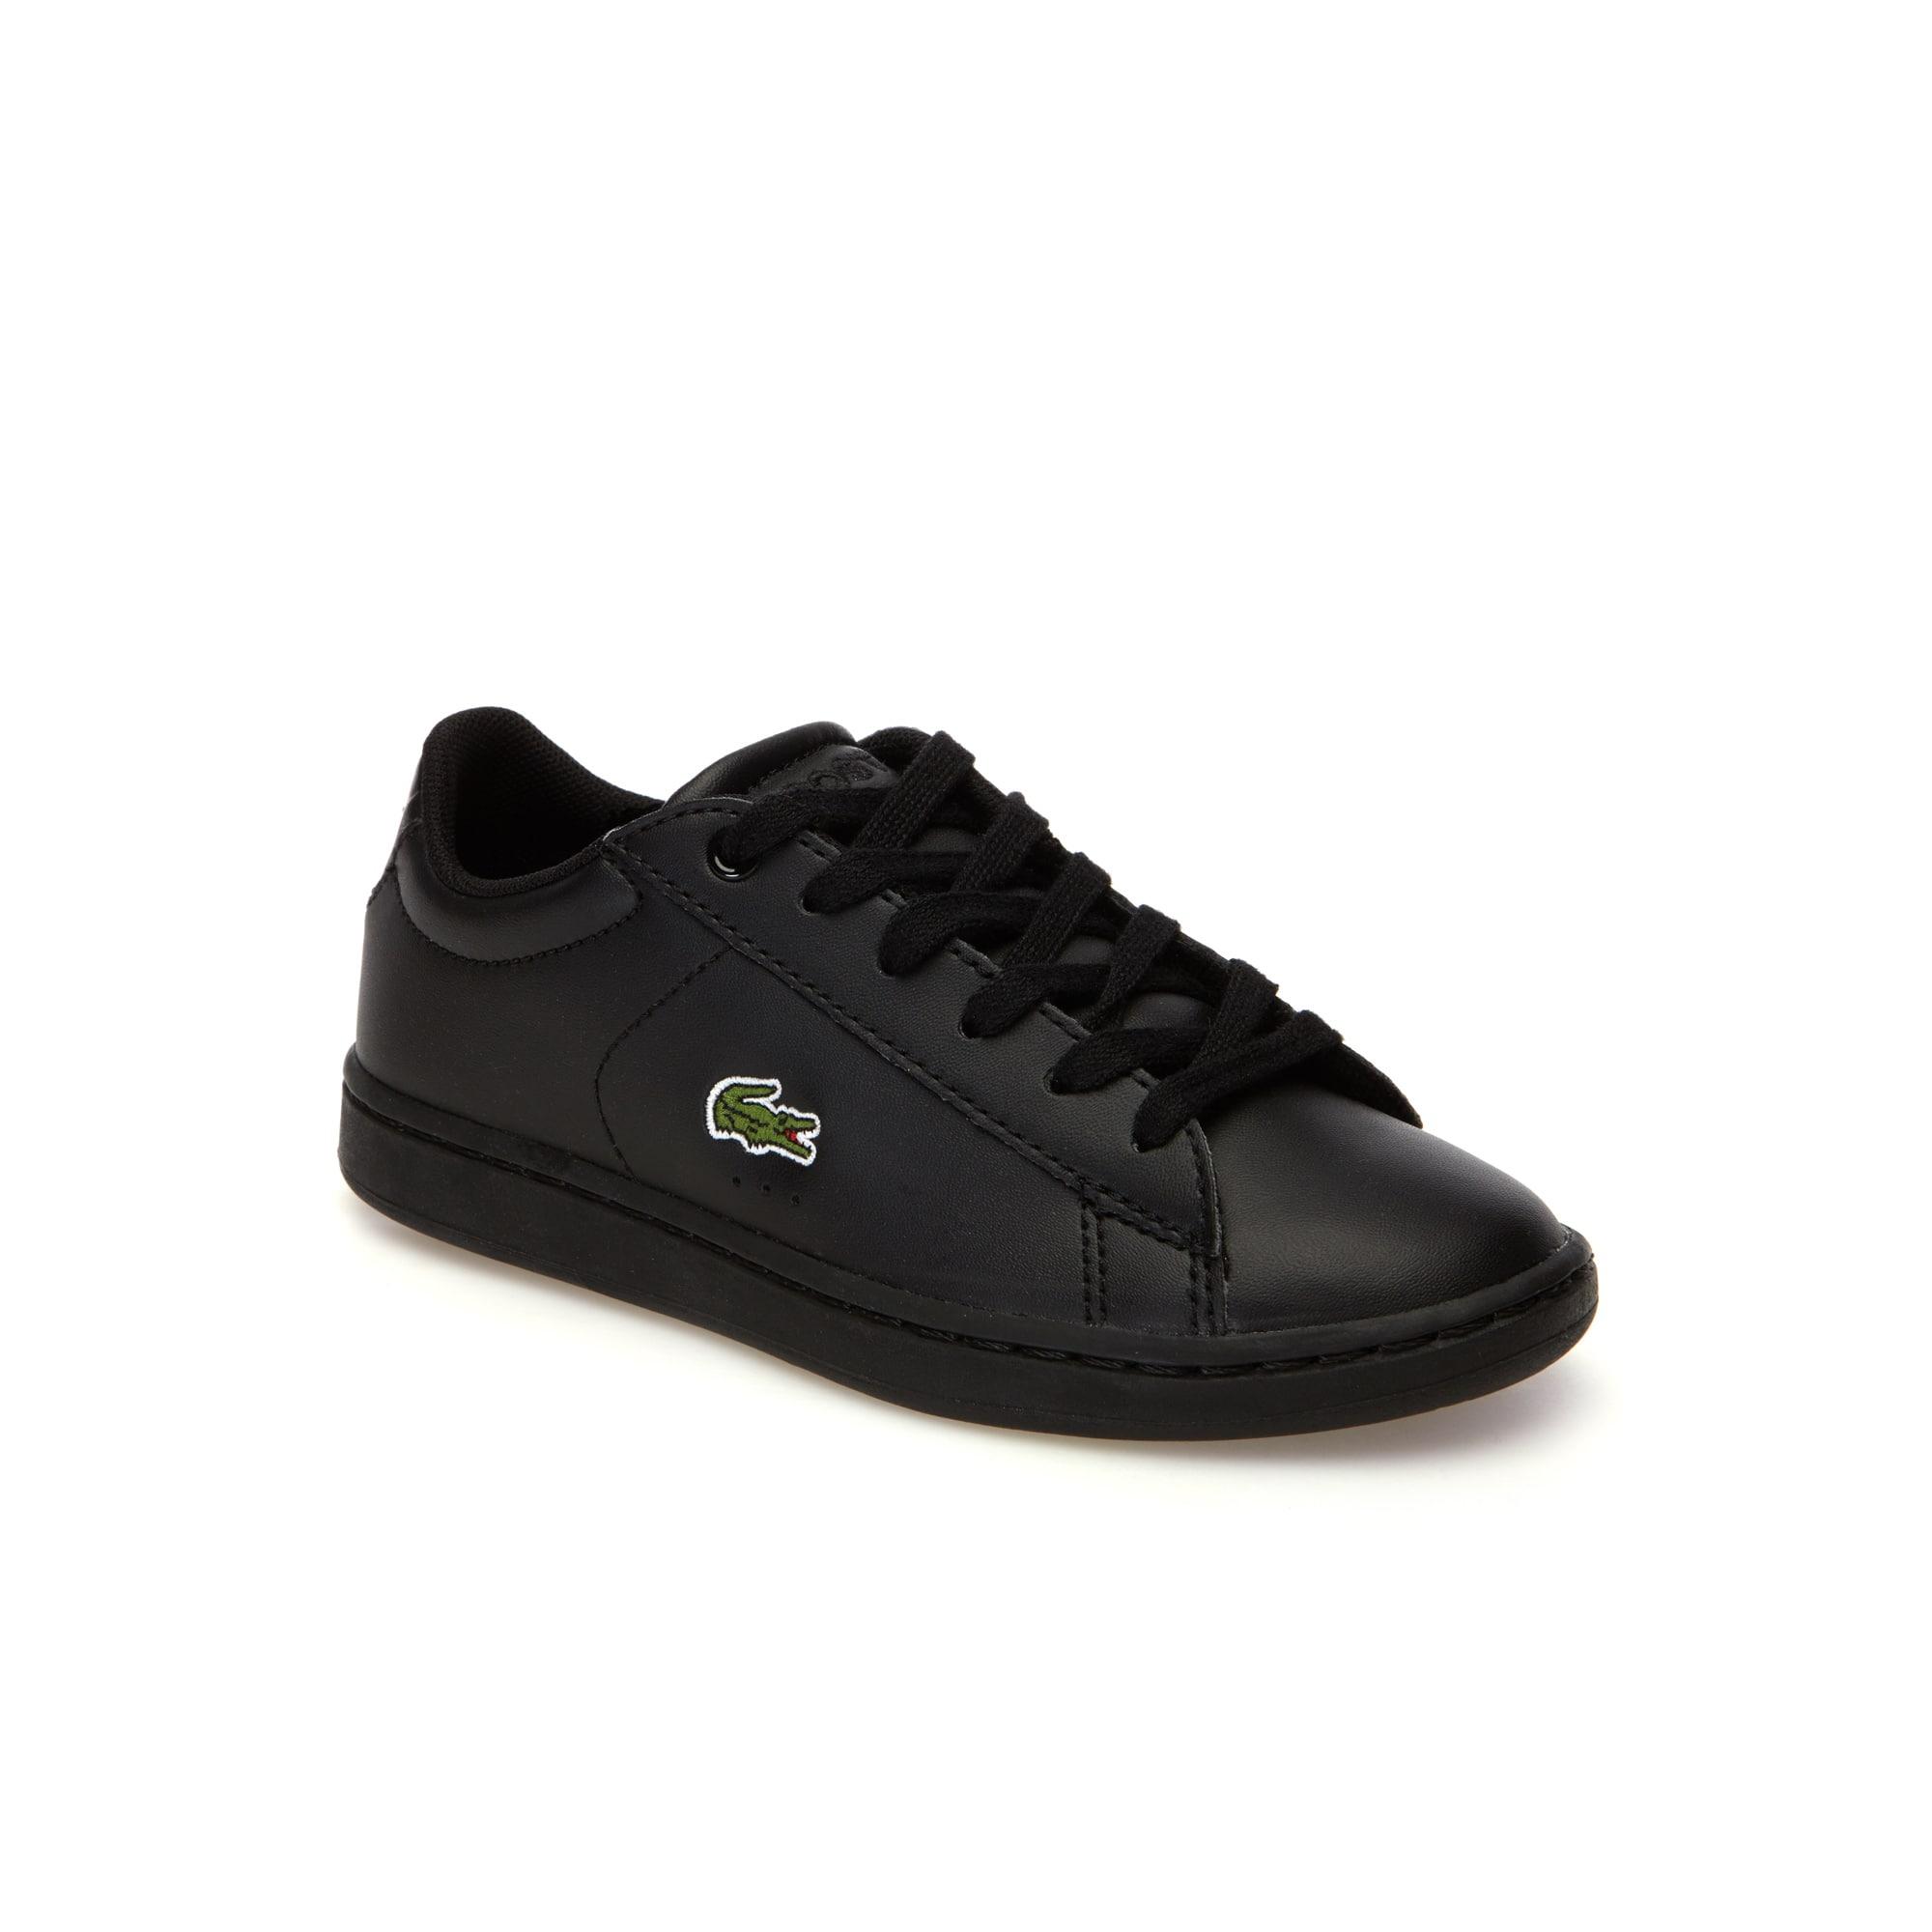 Sneakers Carnaby Evo da bambino in similpelle